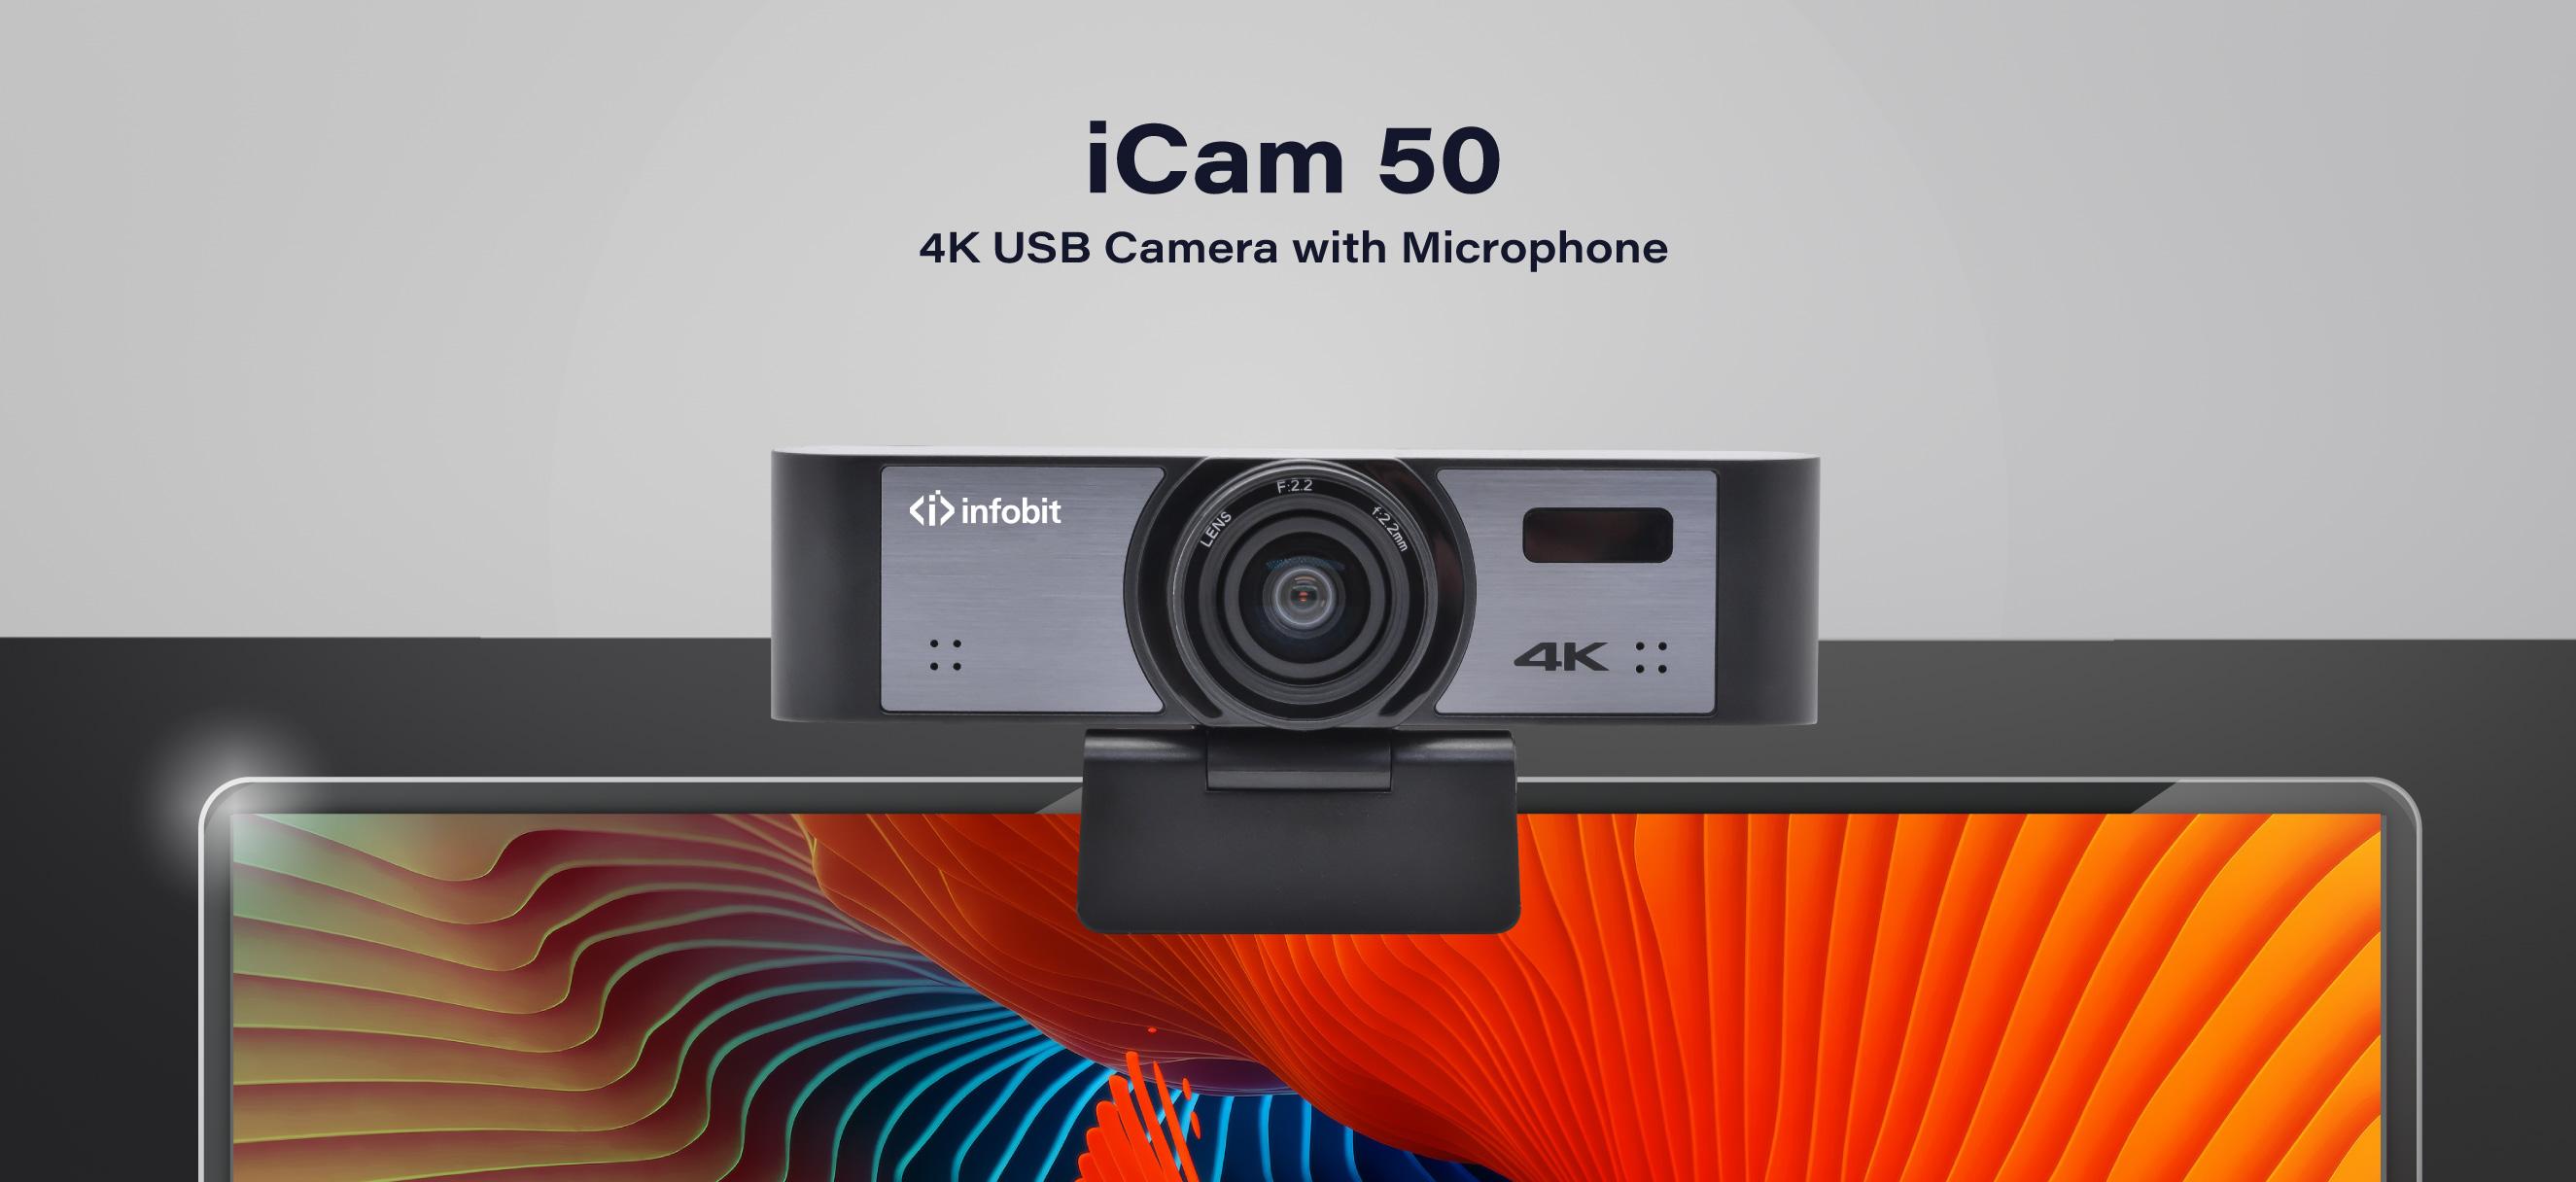 iCam-50-4K-USB camera